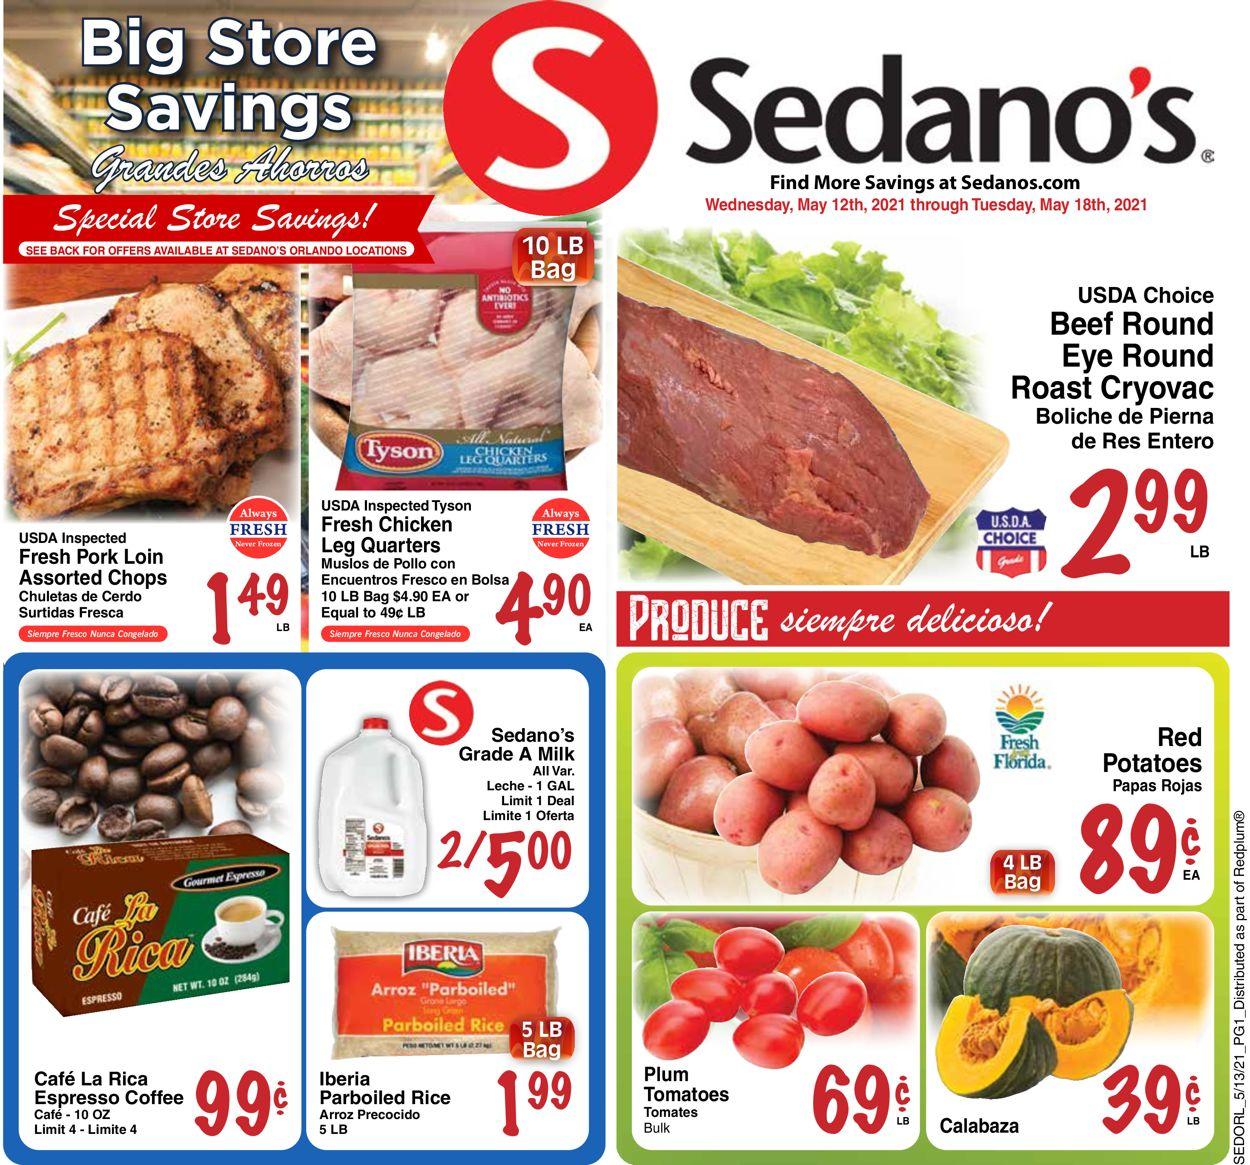 Sedano's Weekly Ad Circular - valid 05/12-05/18/2021